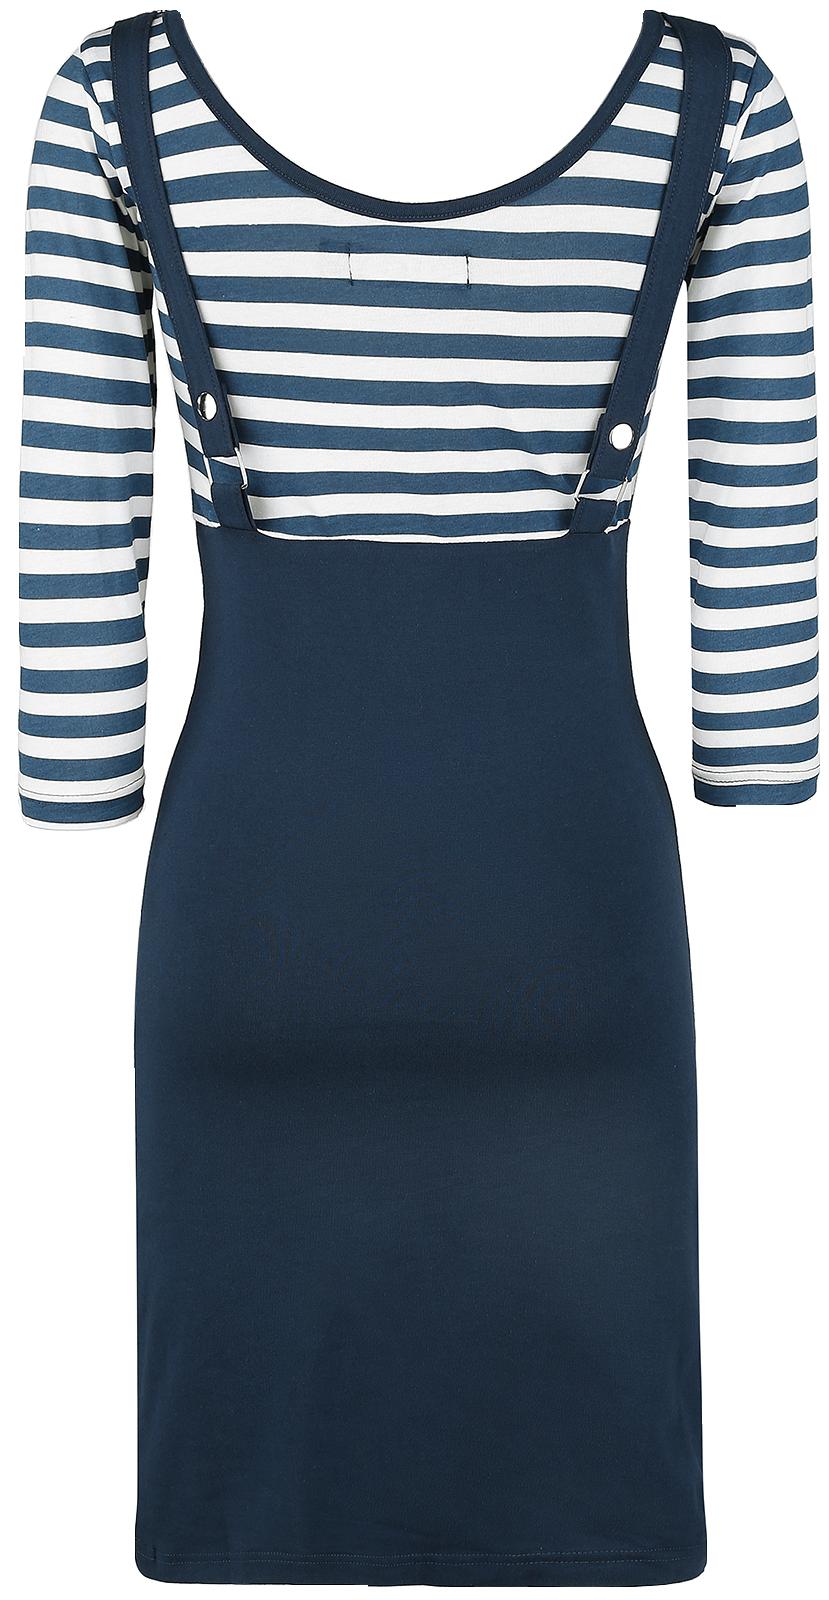 rockabella compass dress kleid blau wei ebay. Black Bedroom Furniture Sets. Home Design Ideas